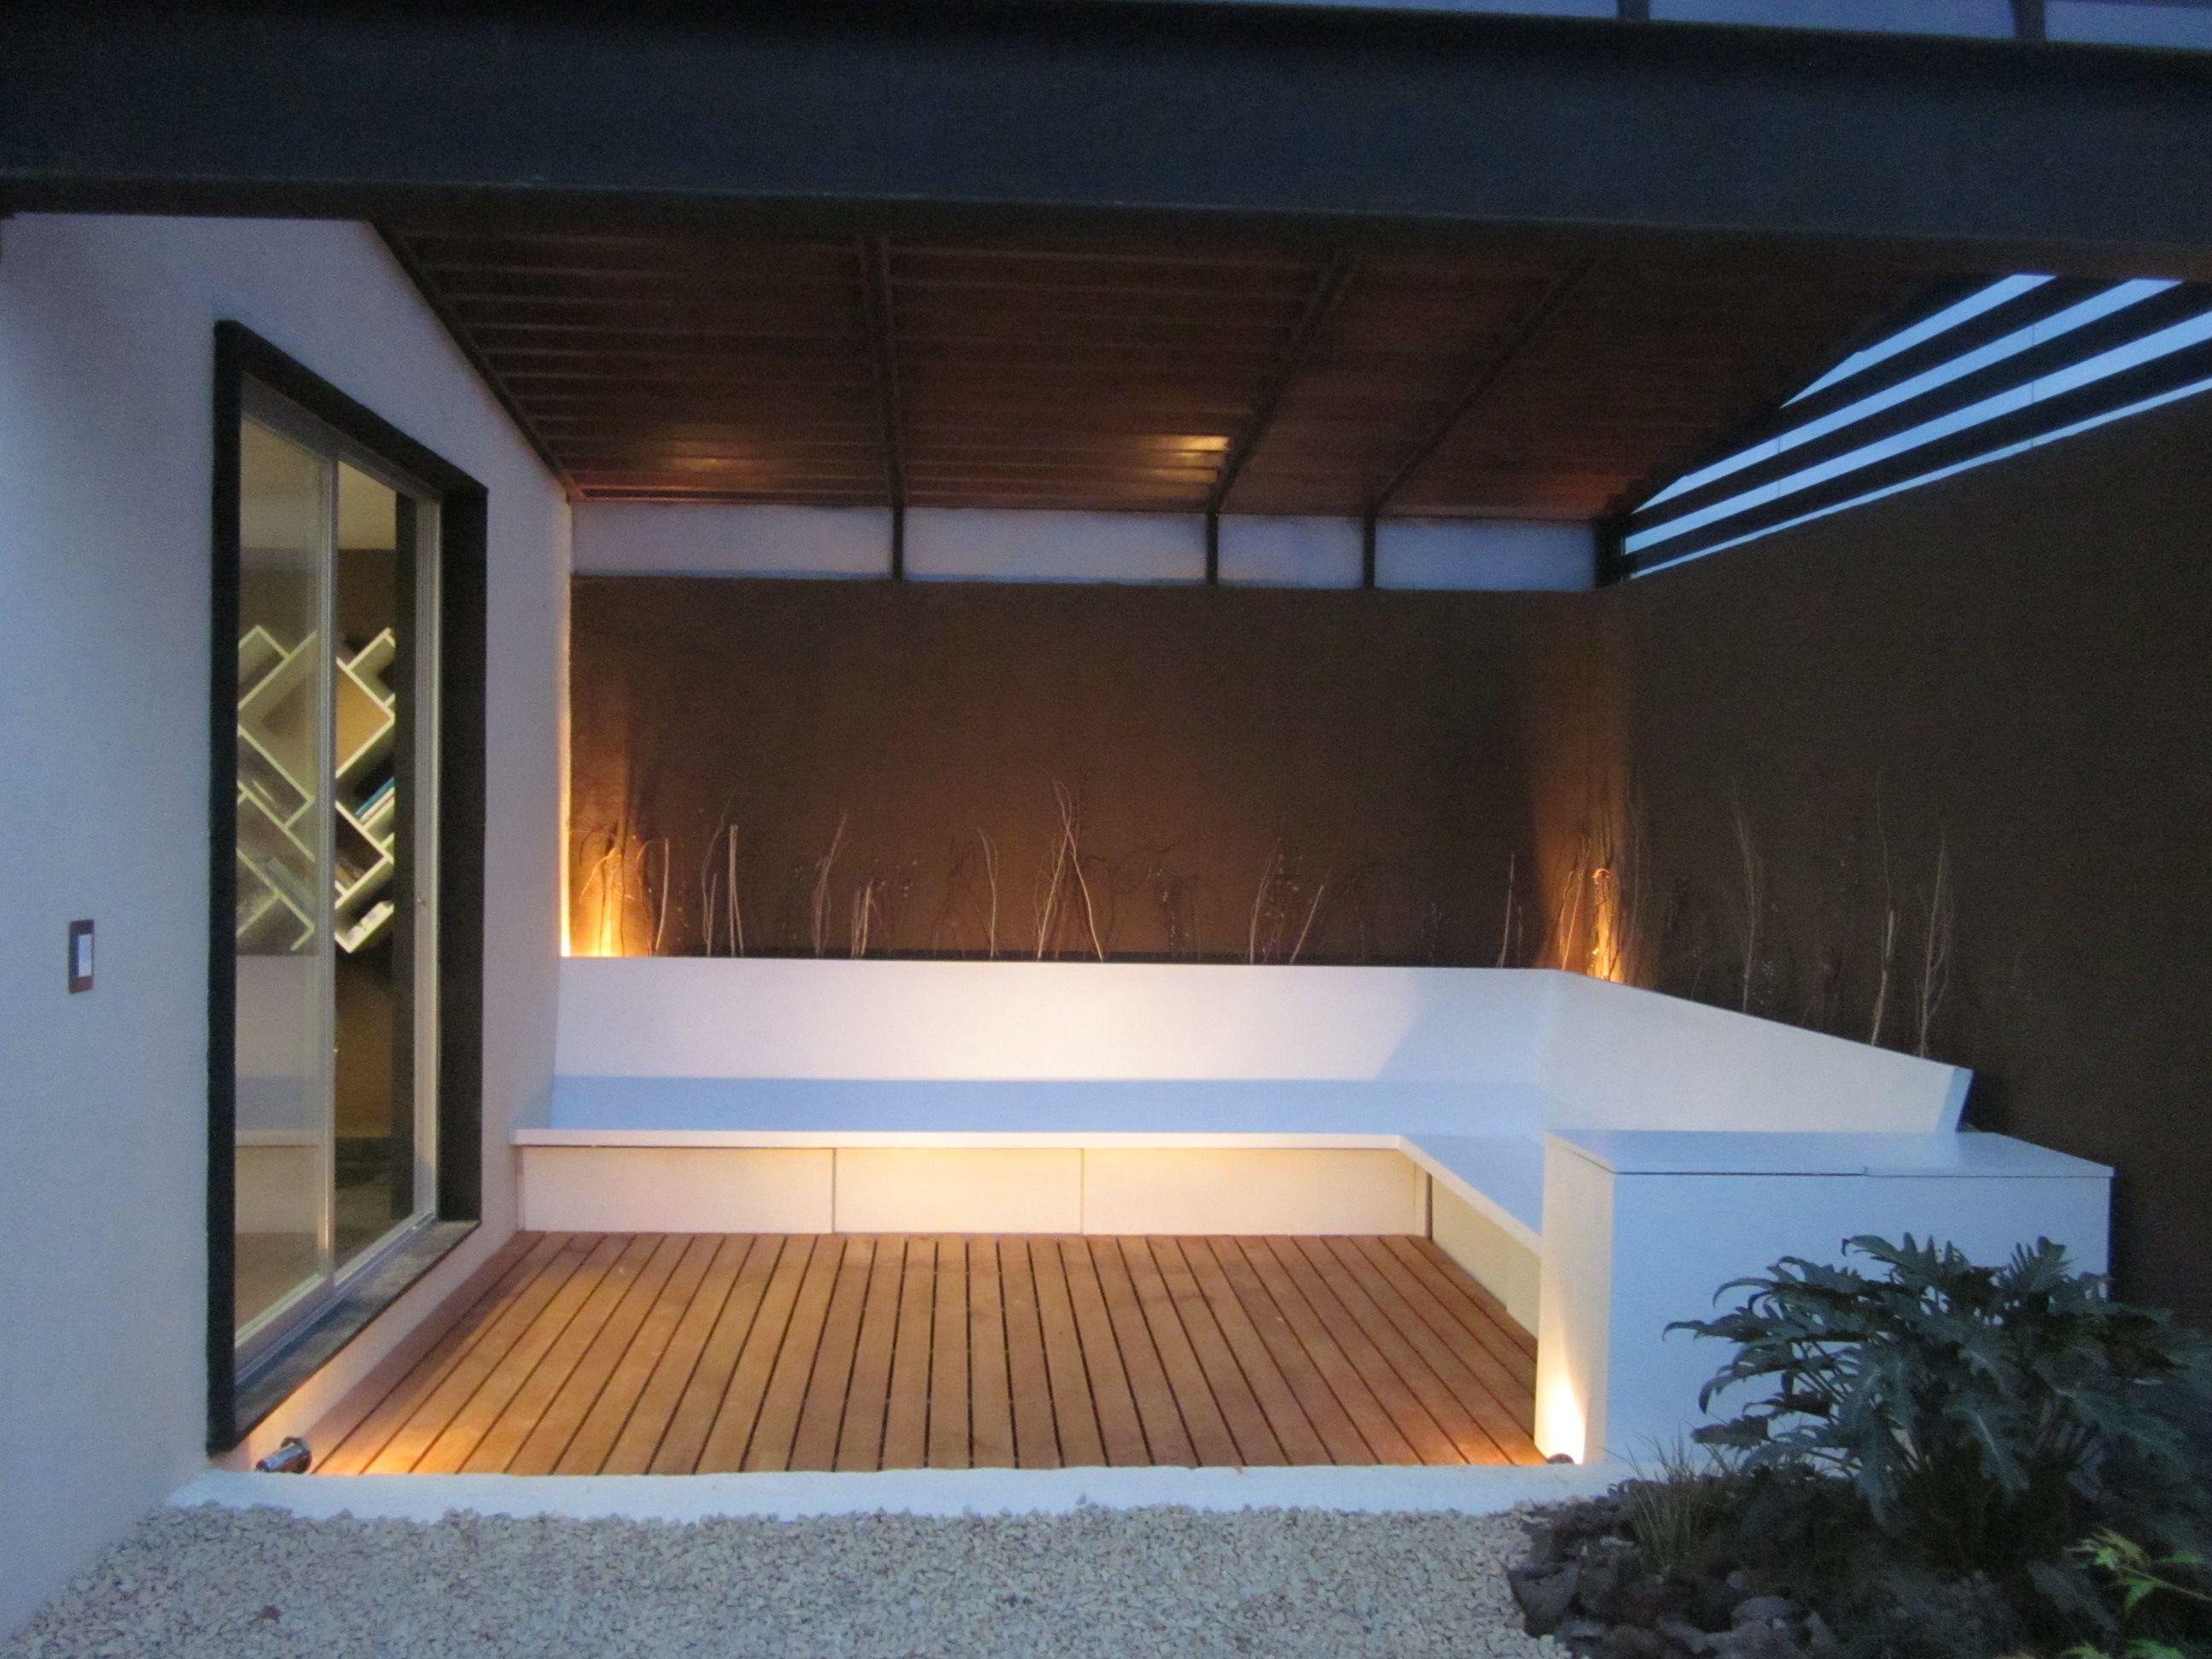 Muebles Para Roof Garden - La Terraza Con Roof Garden Colores En Contraste La Pureza En Los [mjhdah]https://i.pinimg.com/originals/eb/d2/db/ebd2db683ca0b5c3d1c0db9a8cdf9a5a.jpg